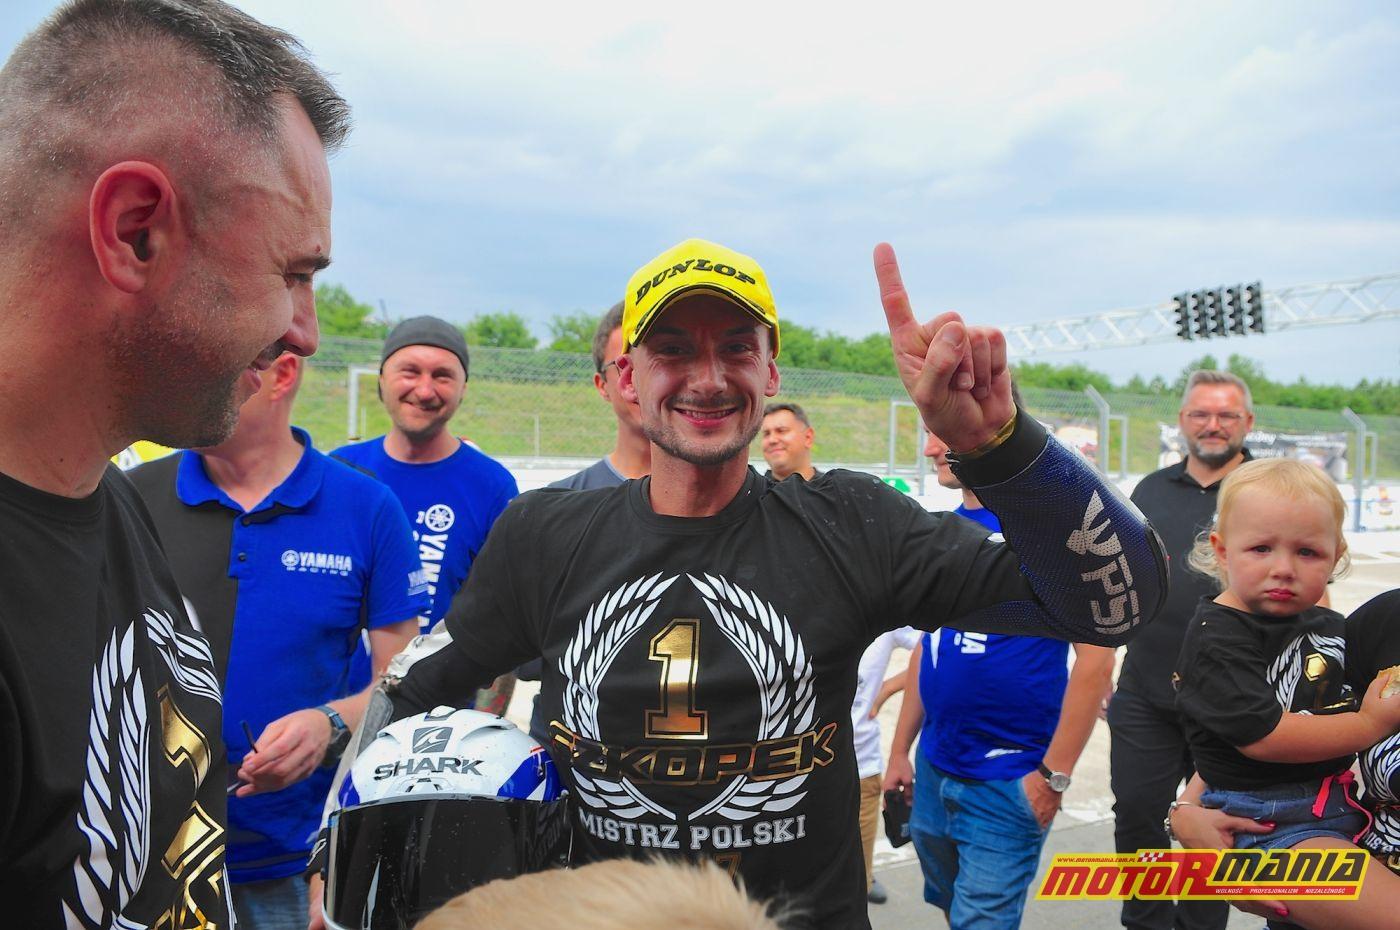 Marek Szkopek po Alpe Adria 2017 - Wojcik FHP Yart racing team (1)